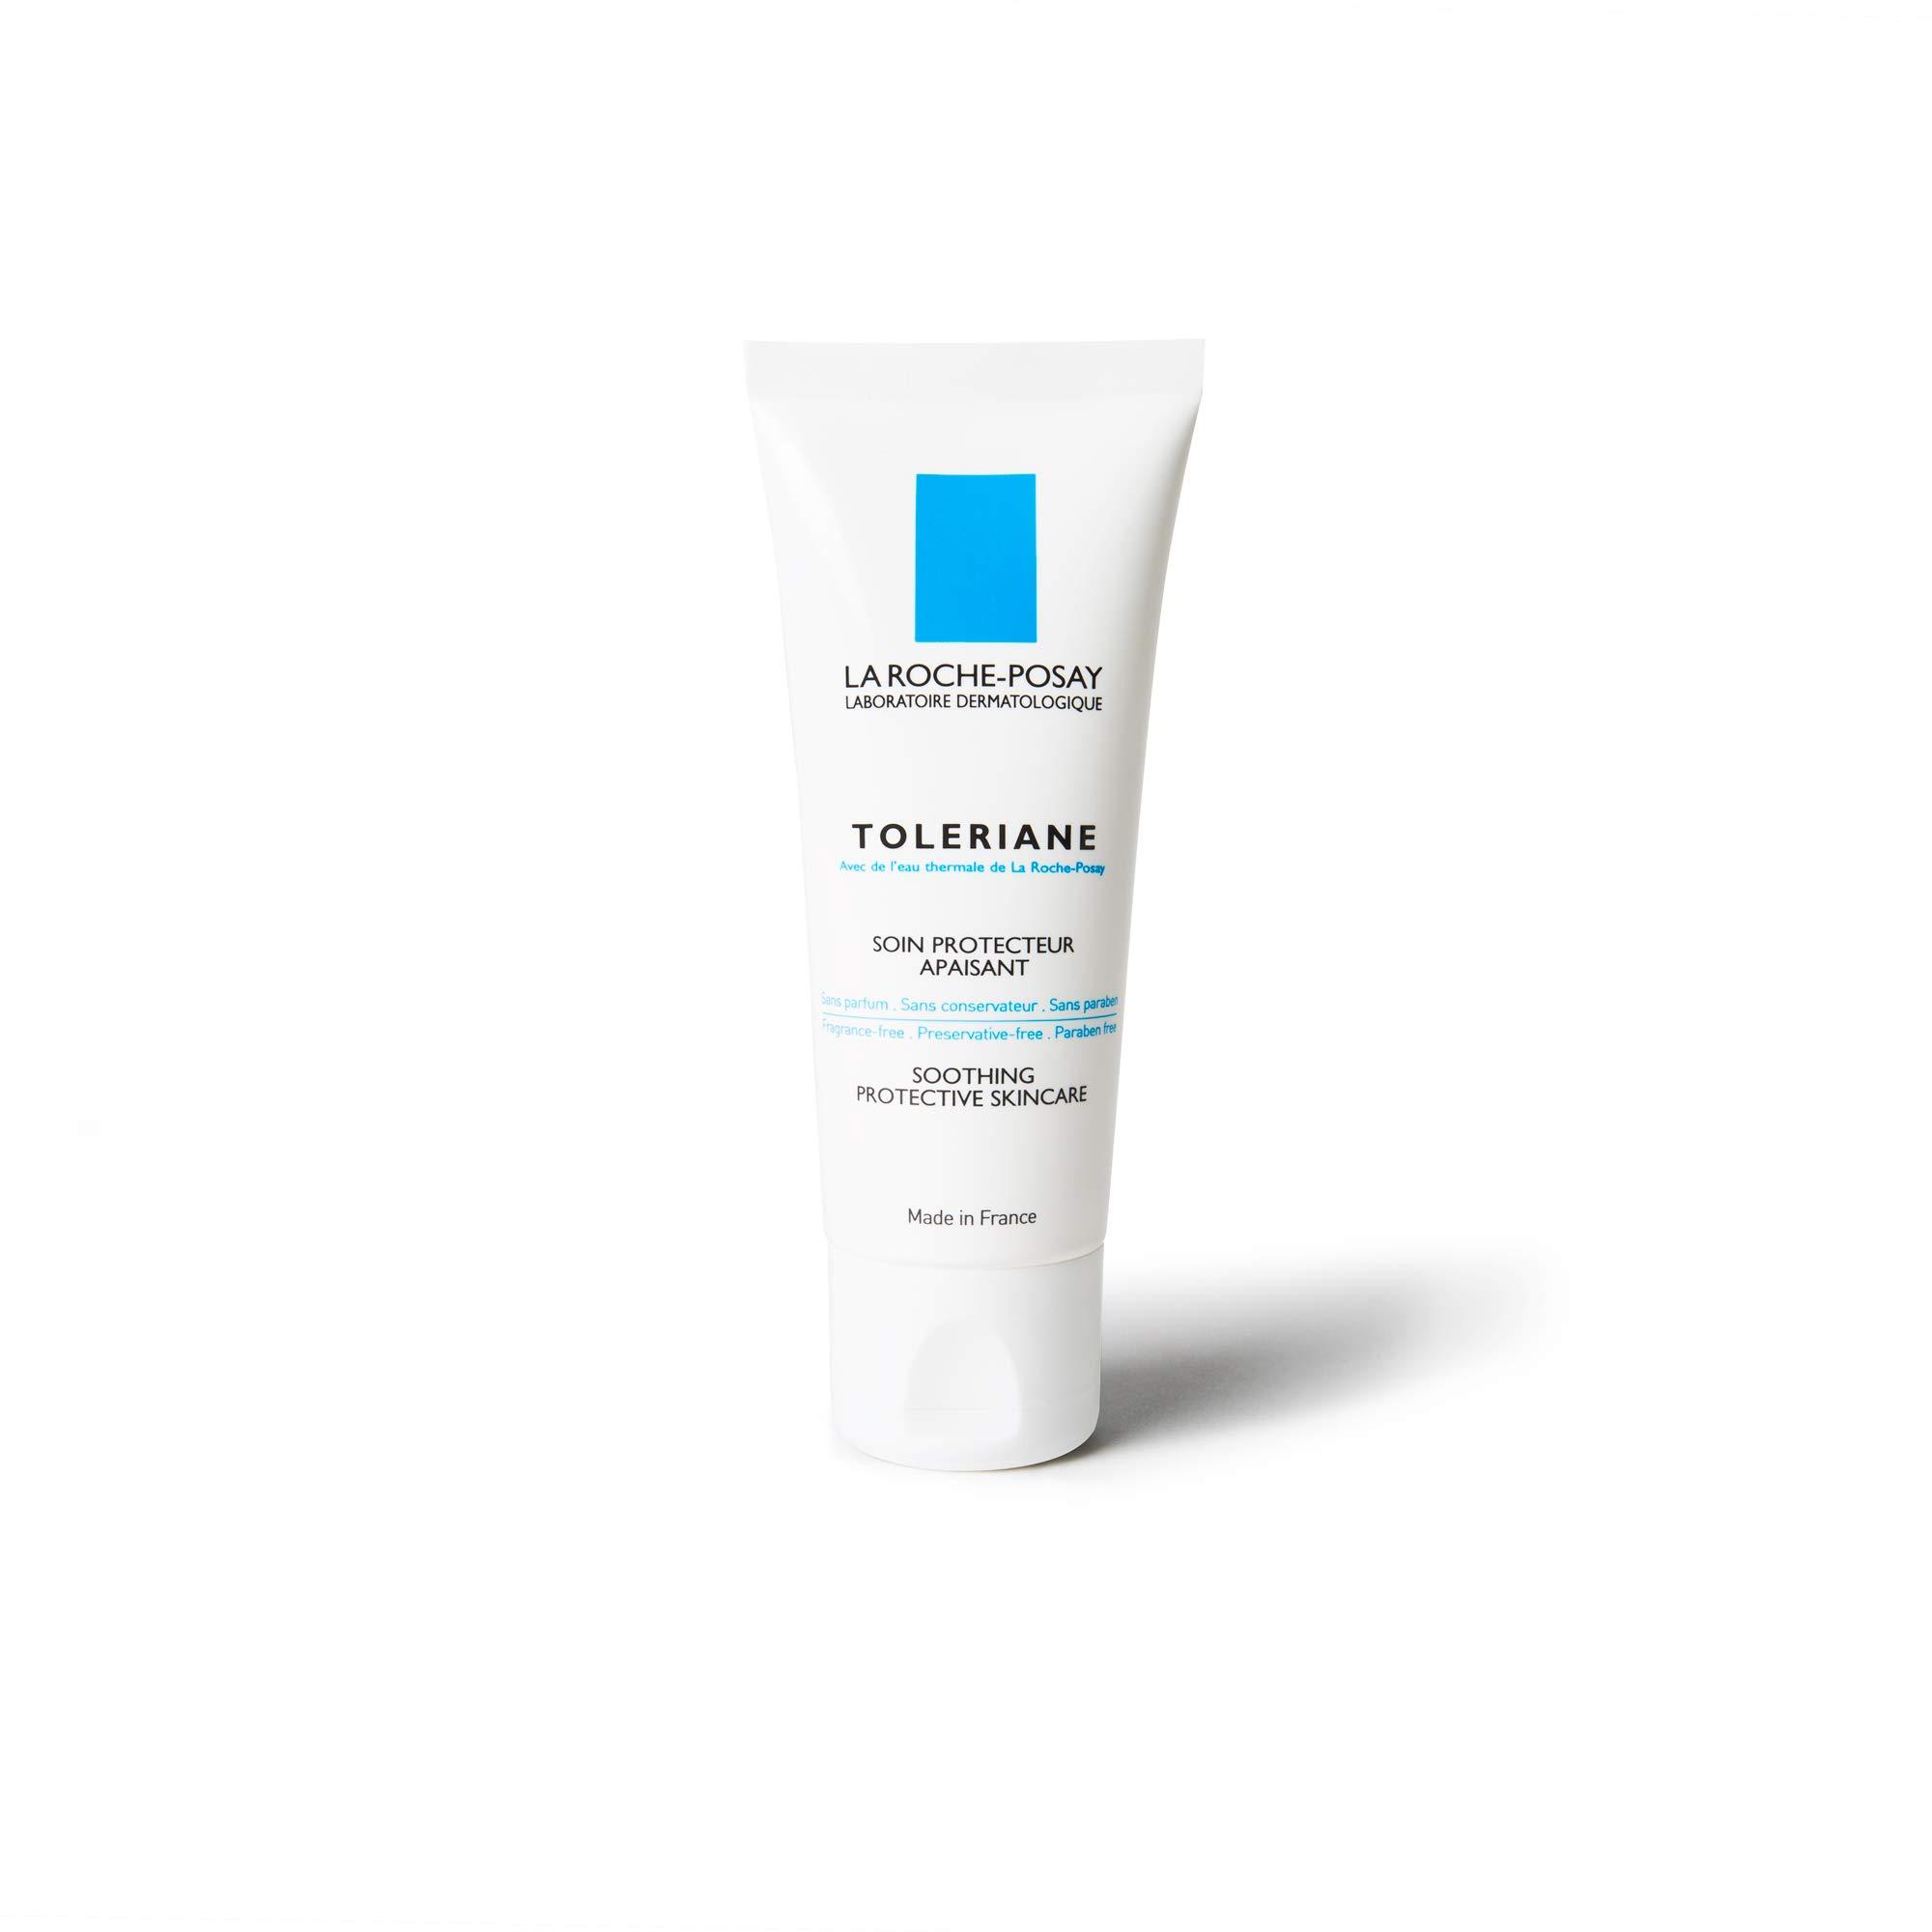 Clarisonic Mia Smart + La Roche Posay Amazon Exclusive Set for Oily, Shiny, or Dry, Sensitive Skin by Clarisonic (Image #5)